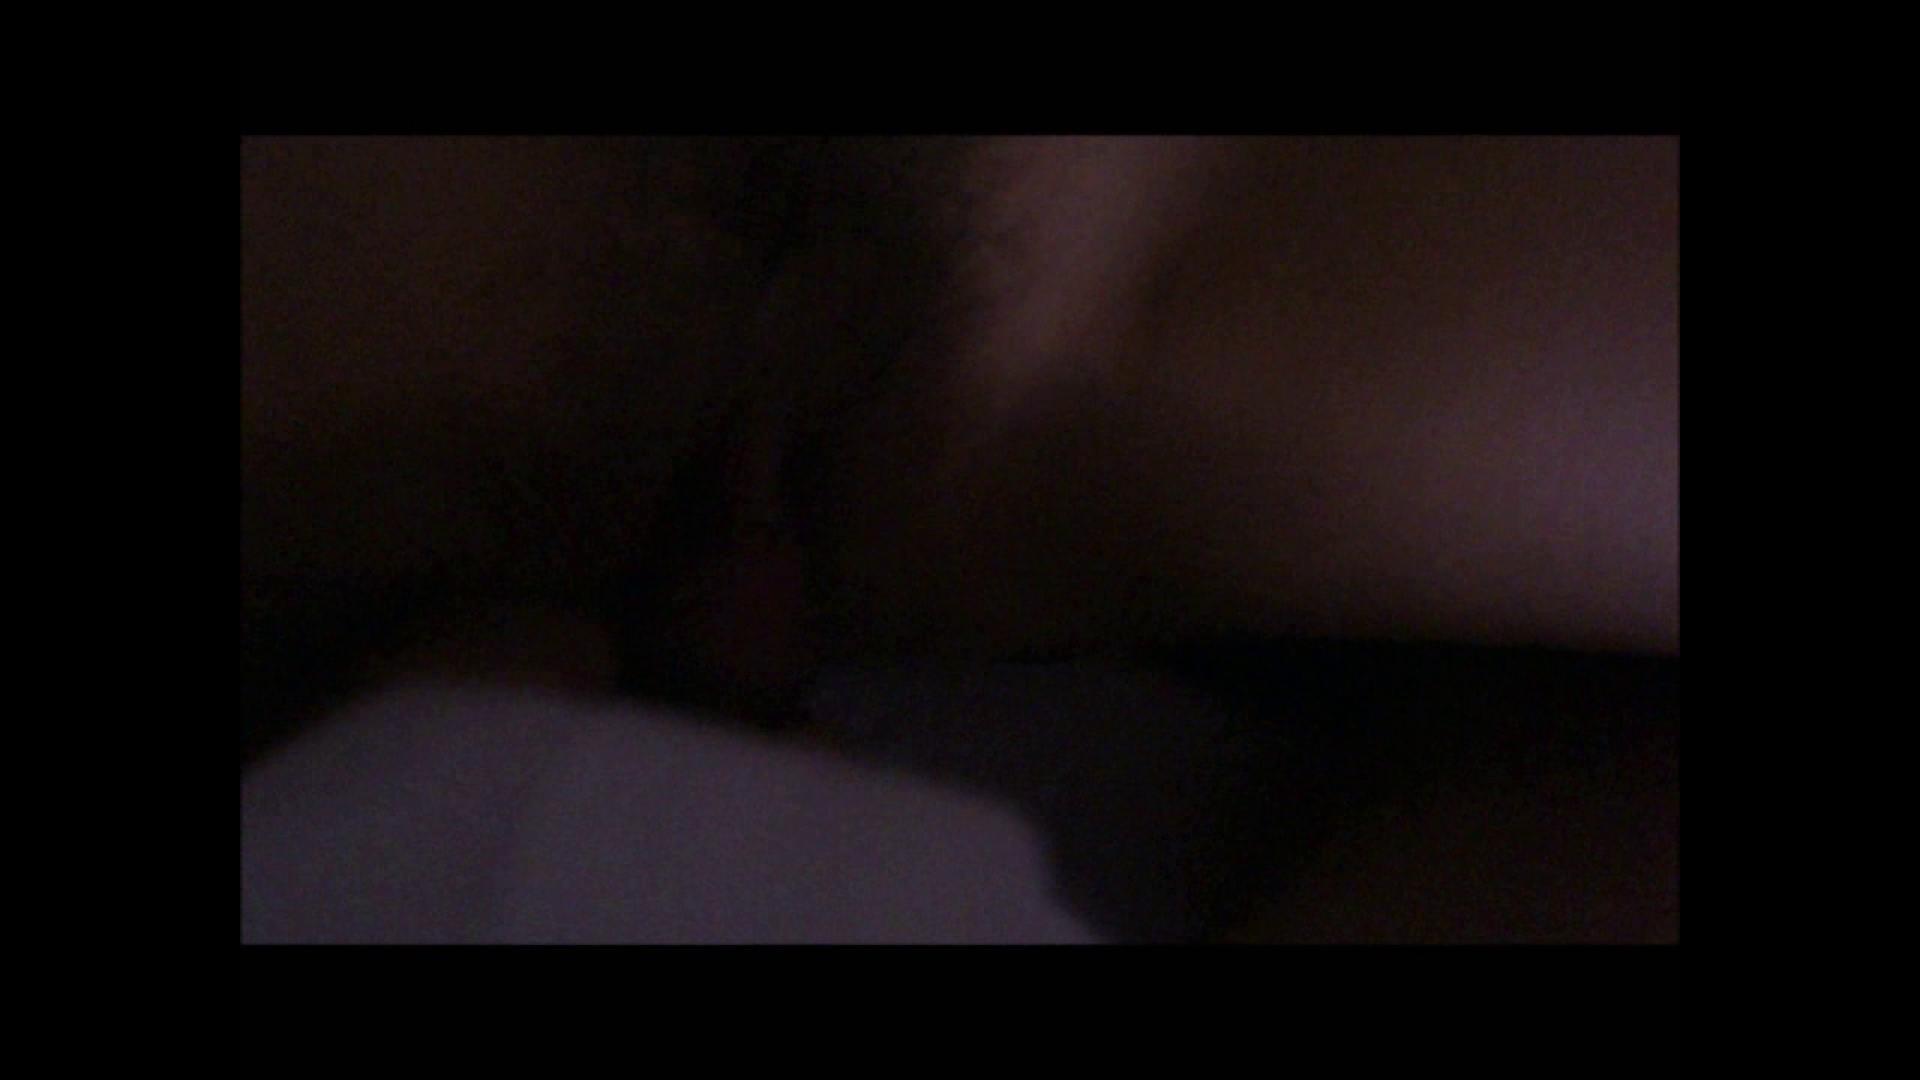 vol.15 友人が抱く葵への感情・・・弄ばれた巨乳。 巨乳 AV動画キャプチャ 76画像 8